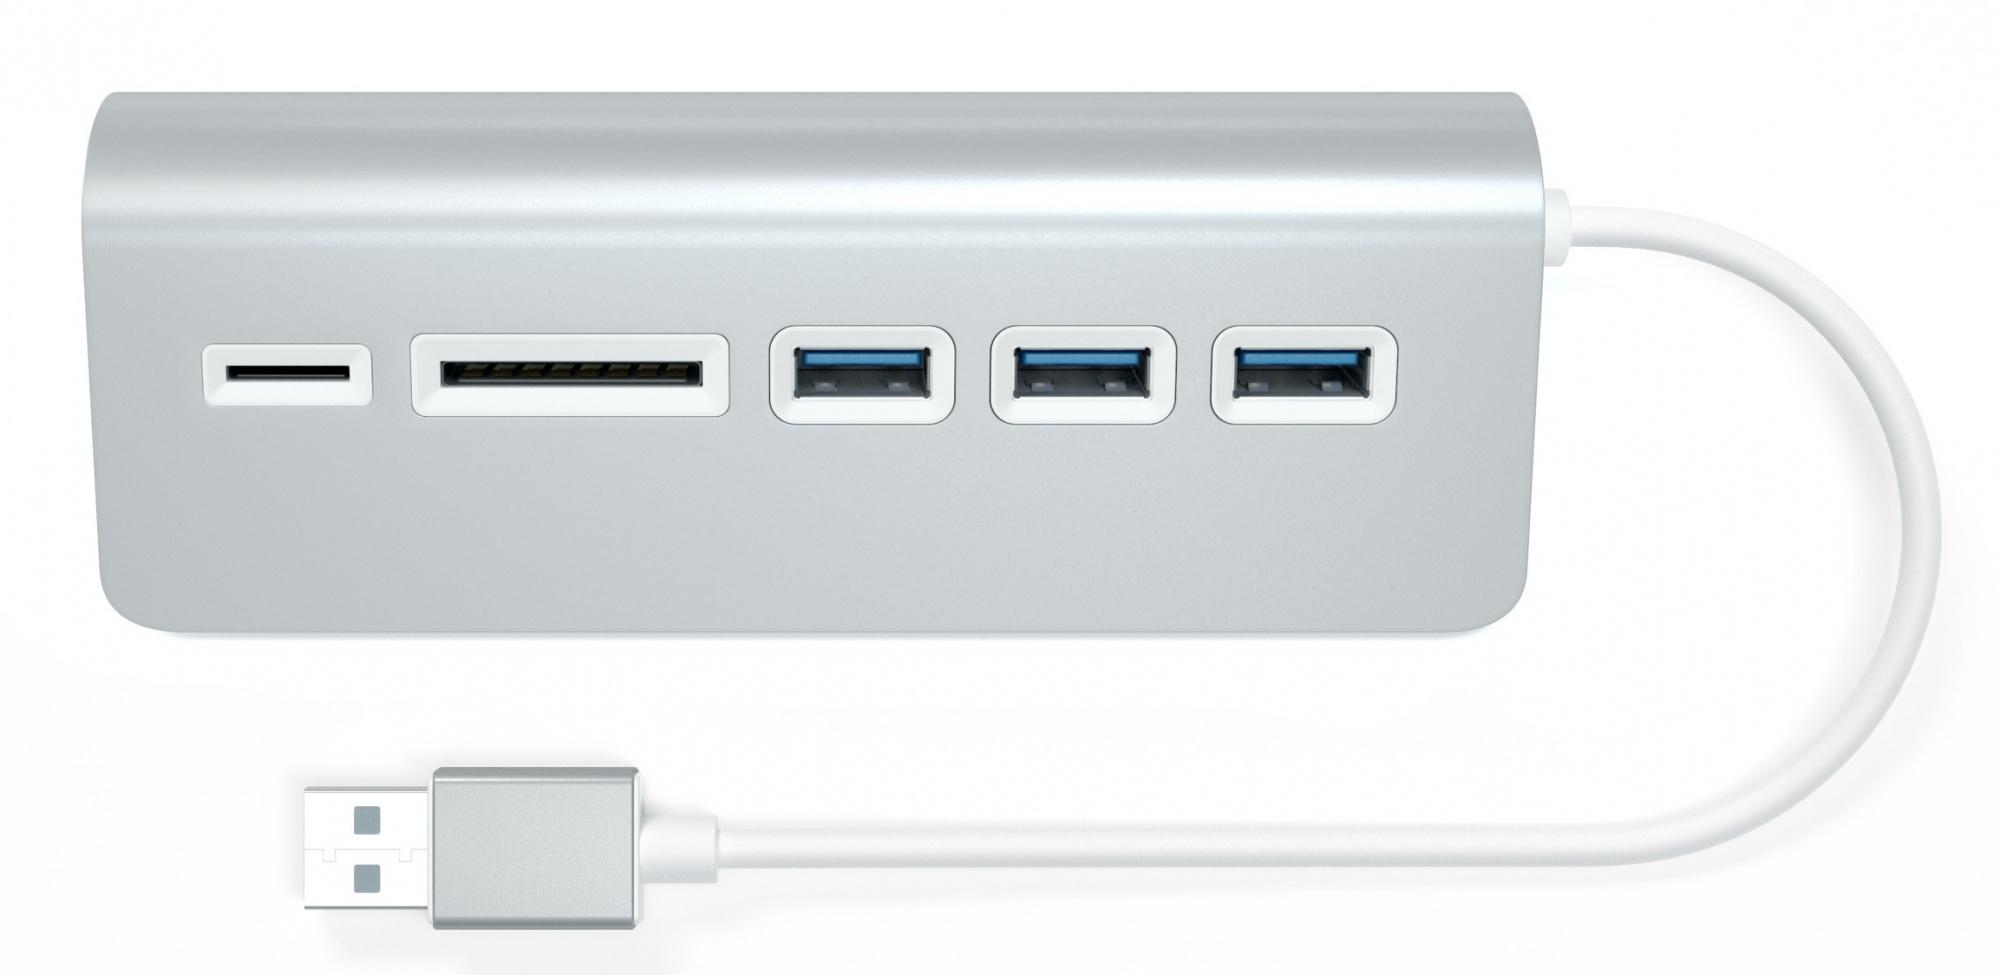 Satechi Aluminum USB 3.0 Hub & Card Reader ST-3HCRS